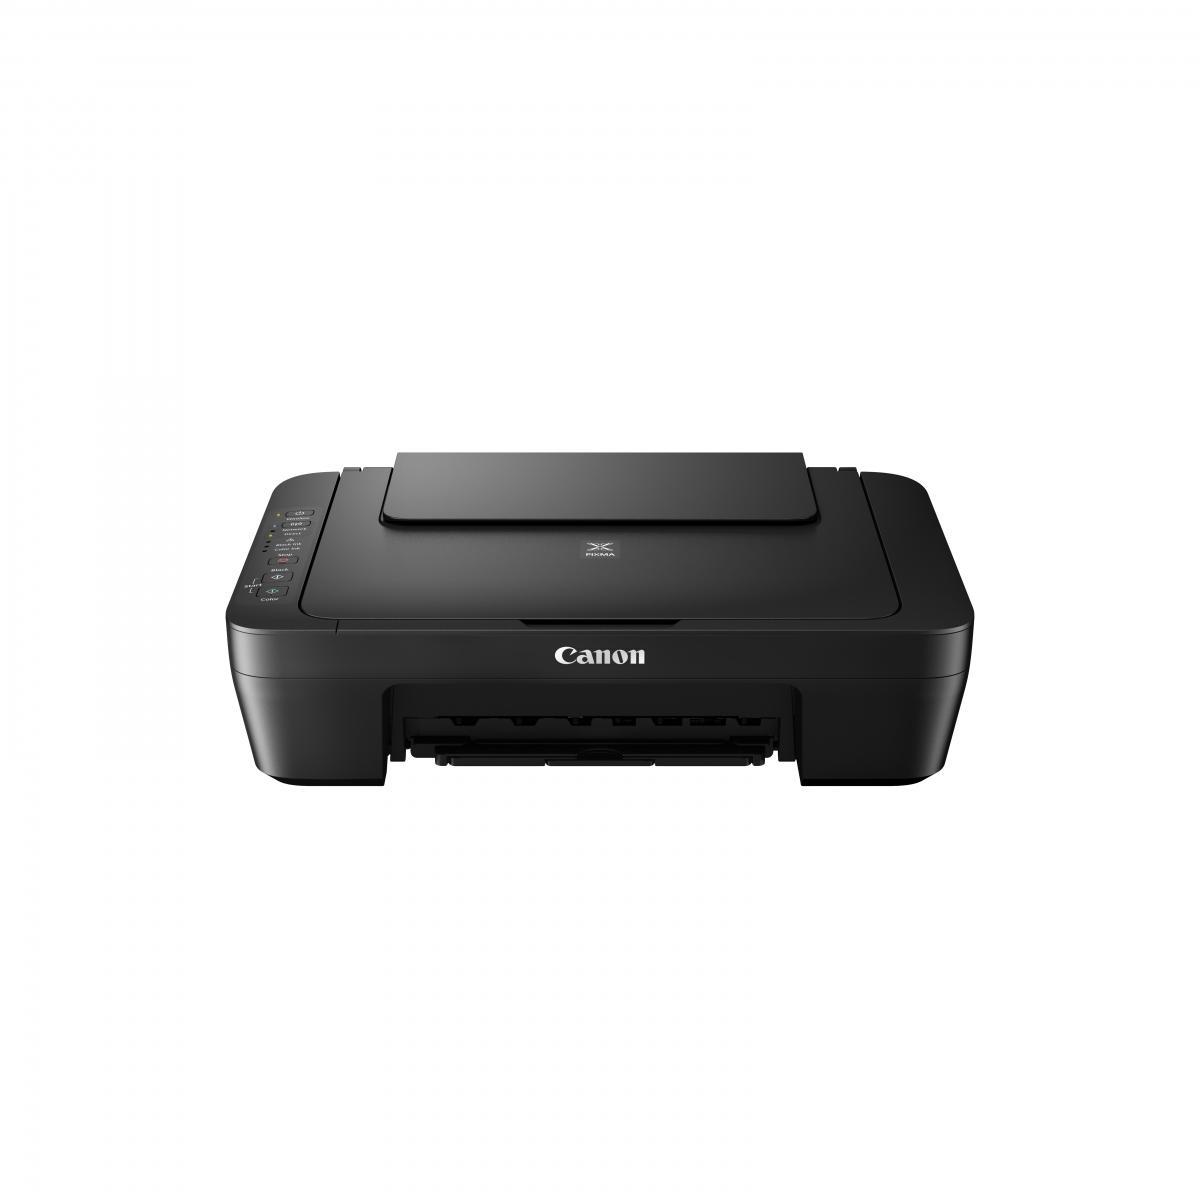 Canon PIXMA MG3050 - PSC/Wi-Fi/AP/4800x600/USB black 1346C006